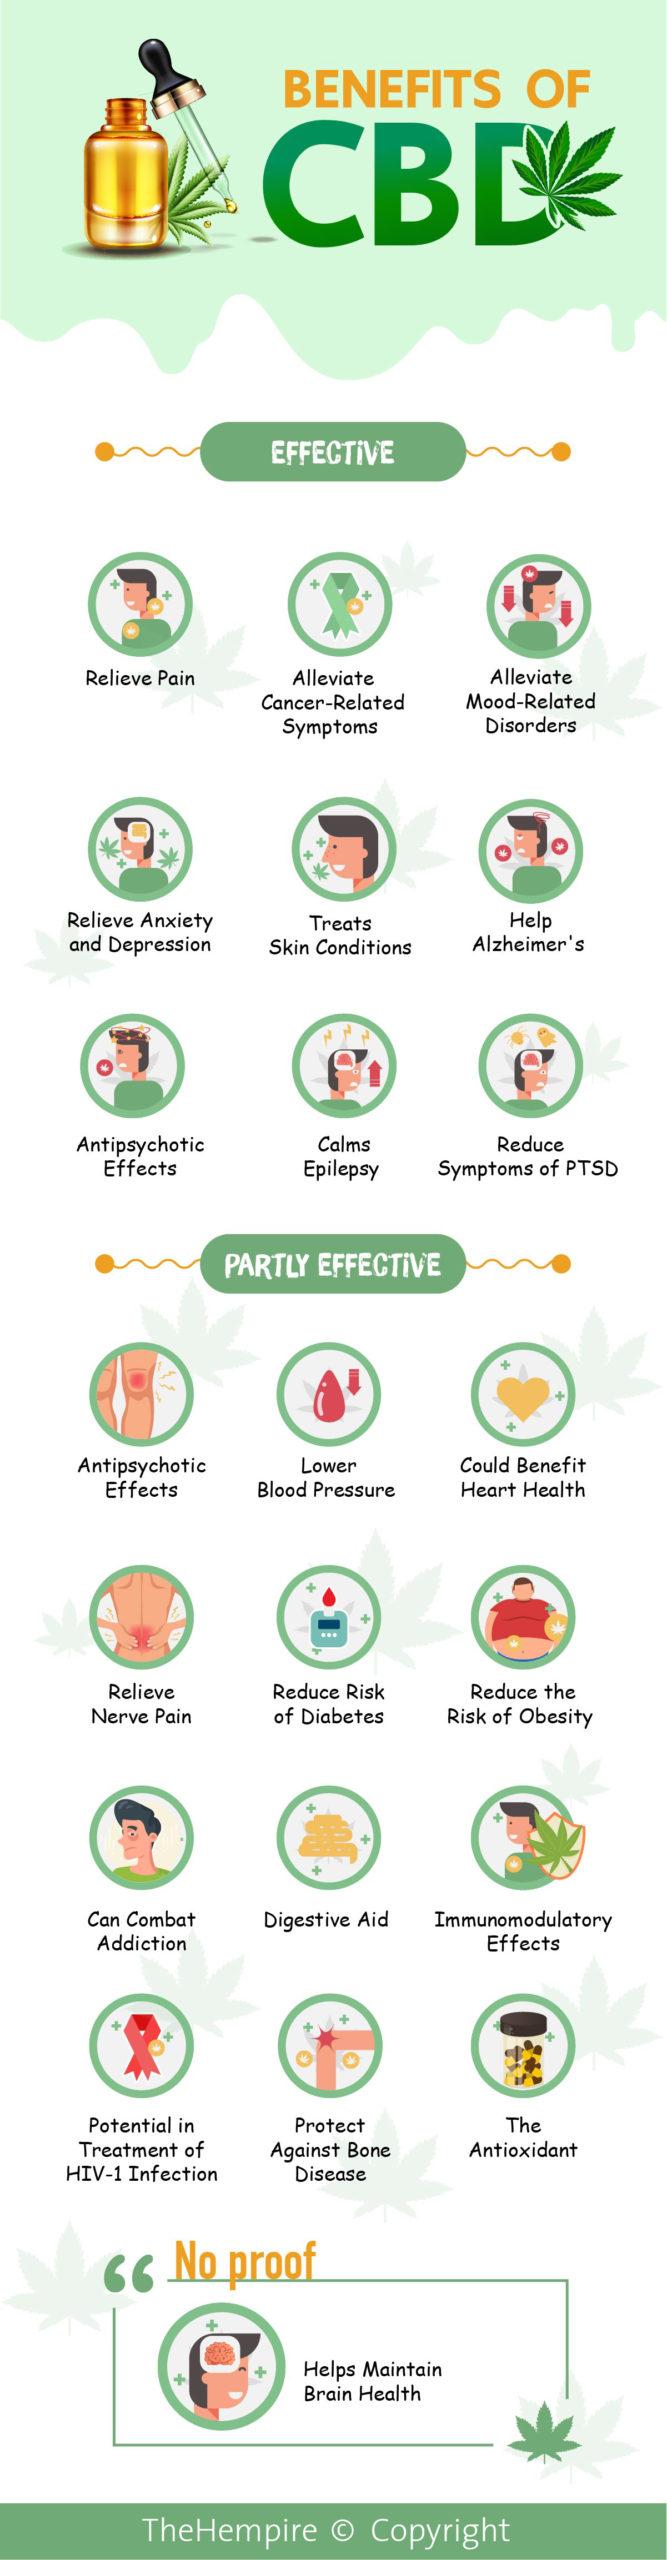 Benefits of CBD-01-01